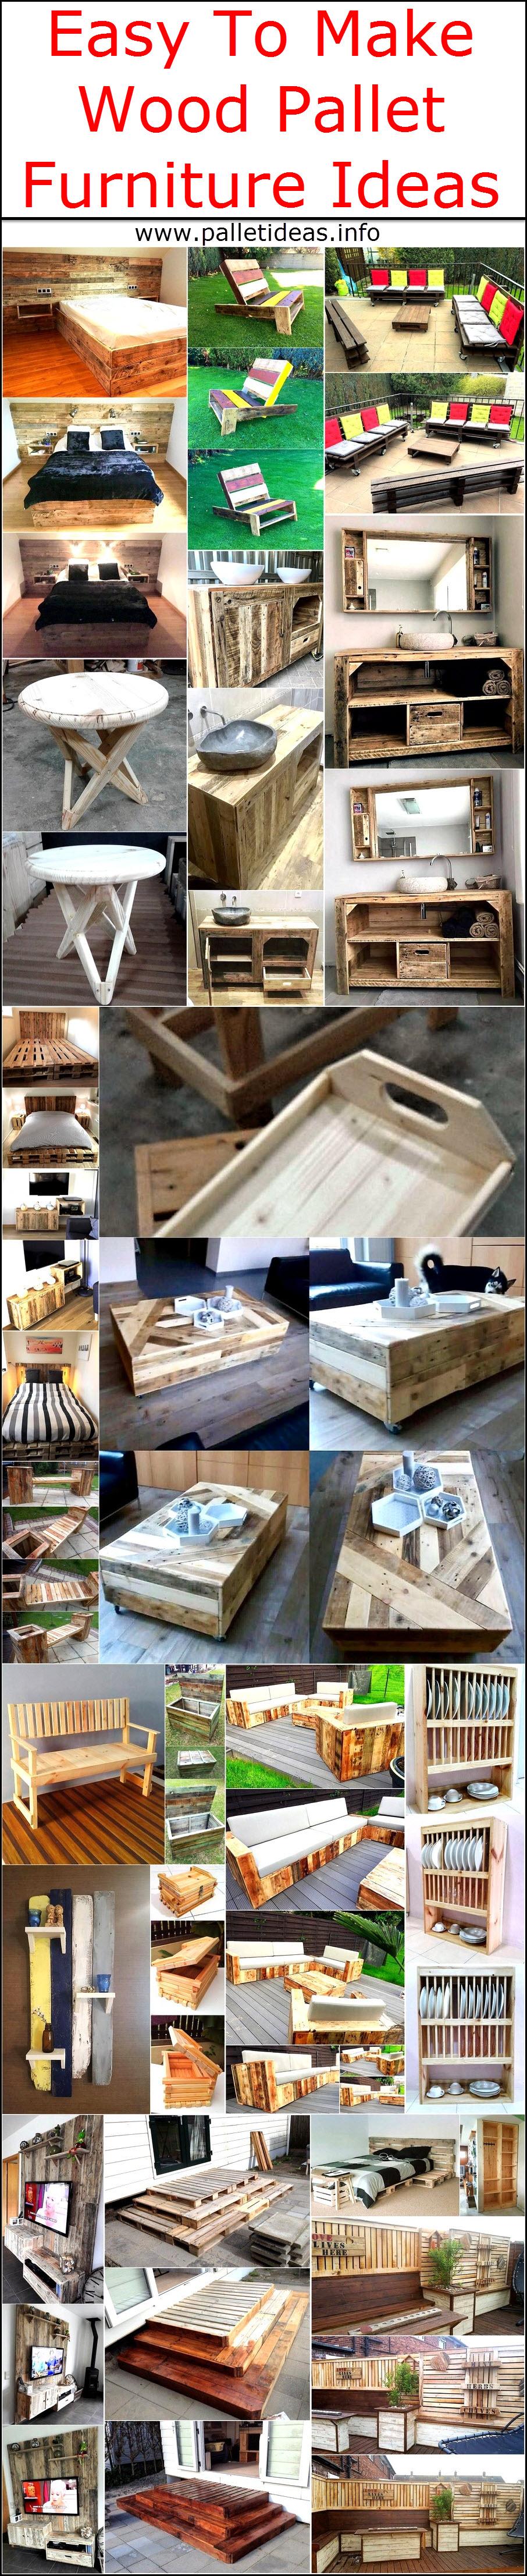 Easy To Make Wood Pallet Furniture Ideas Pallet Ideas